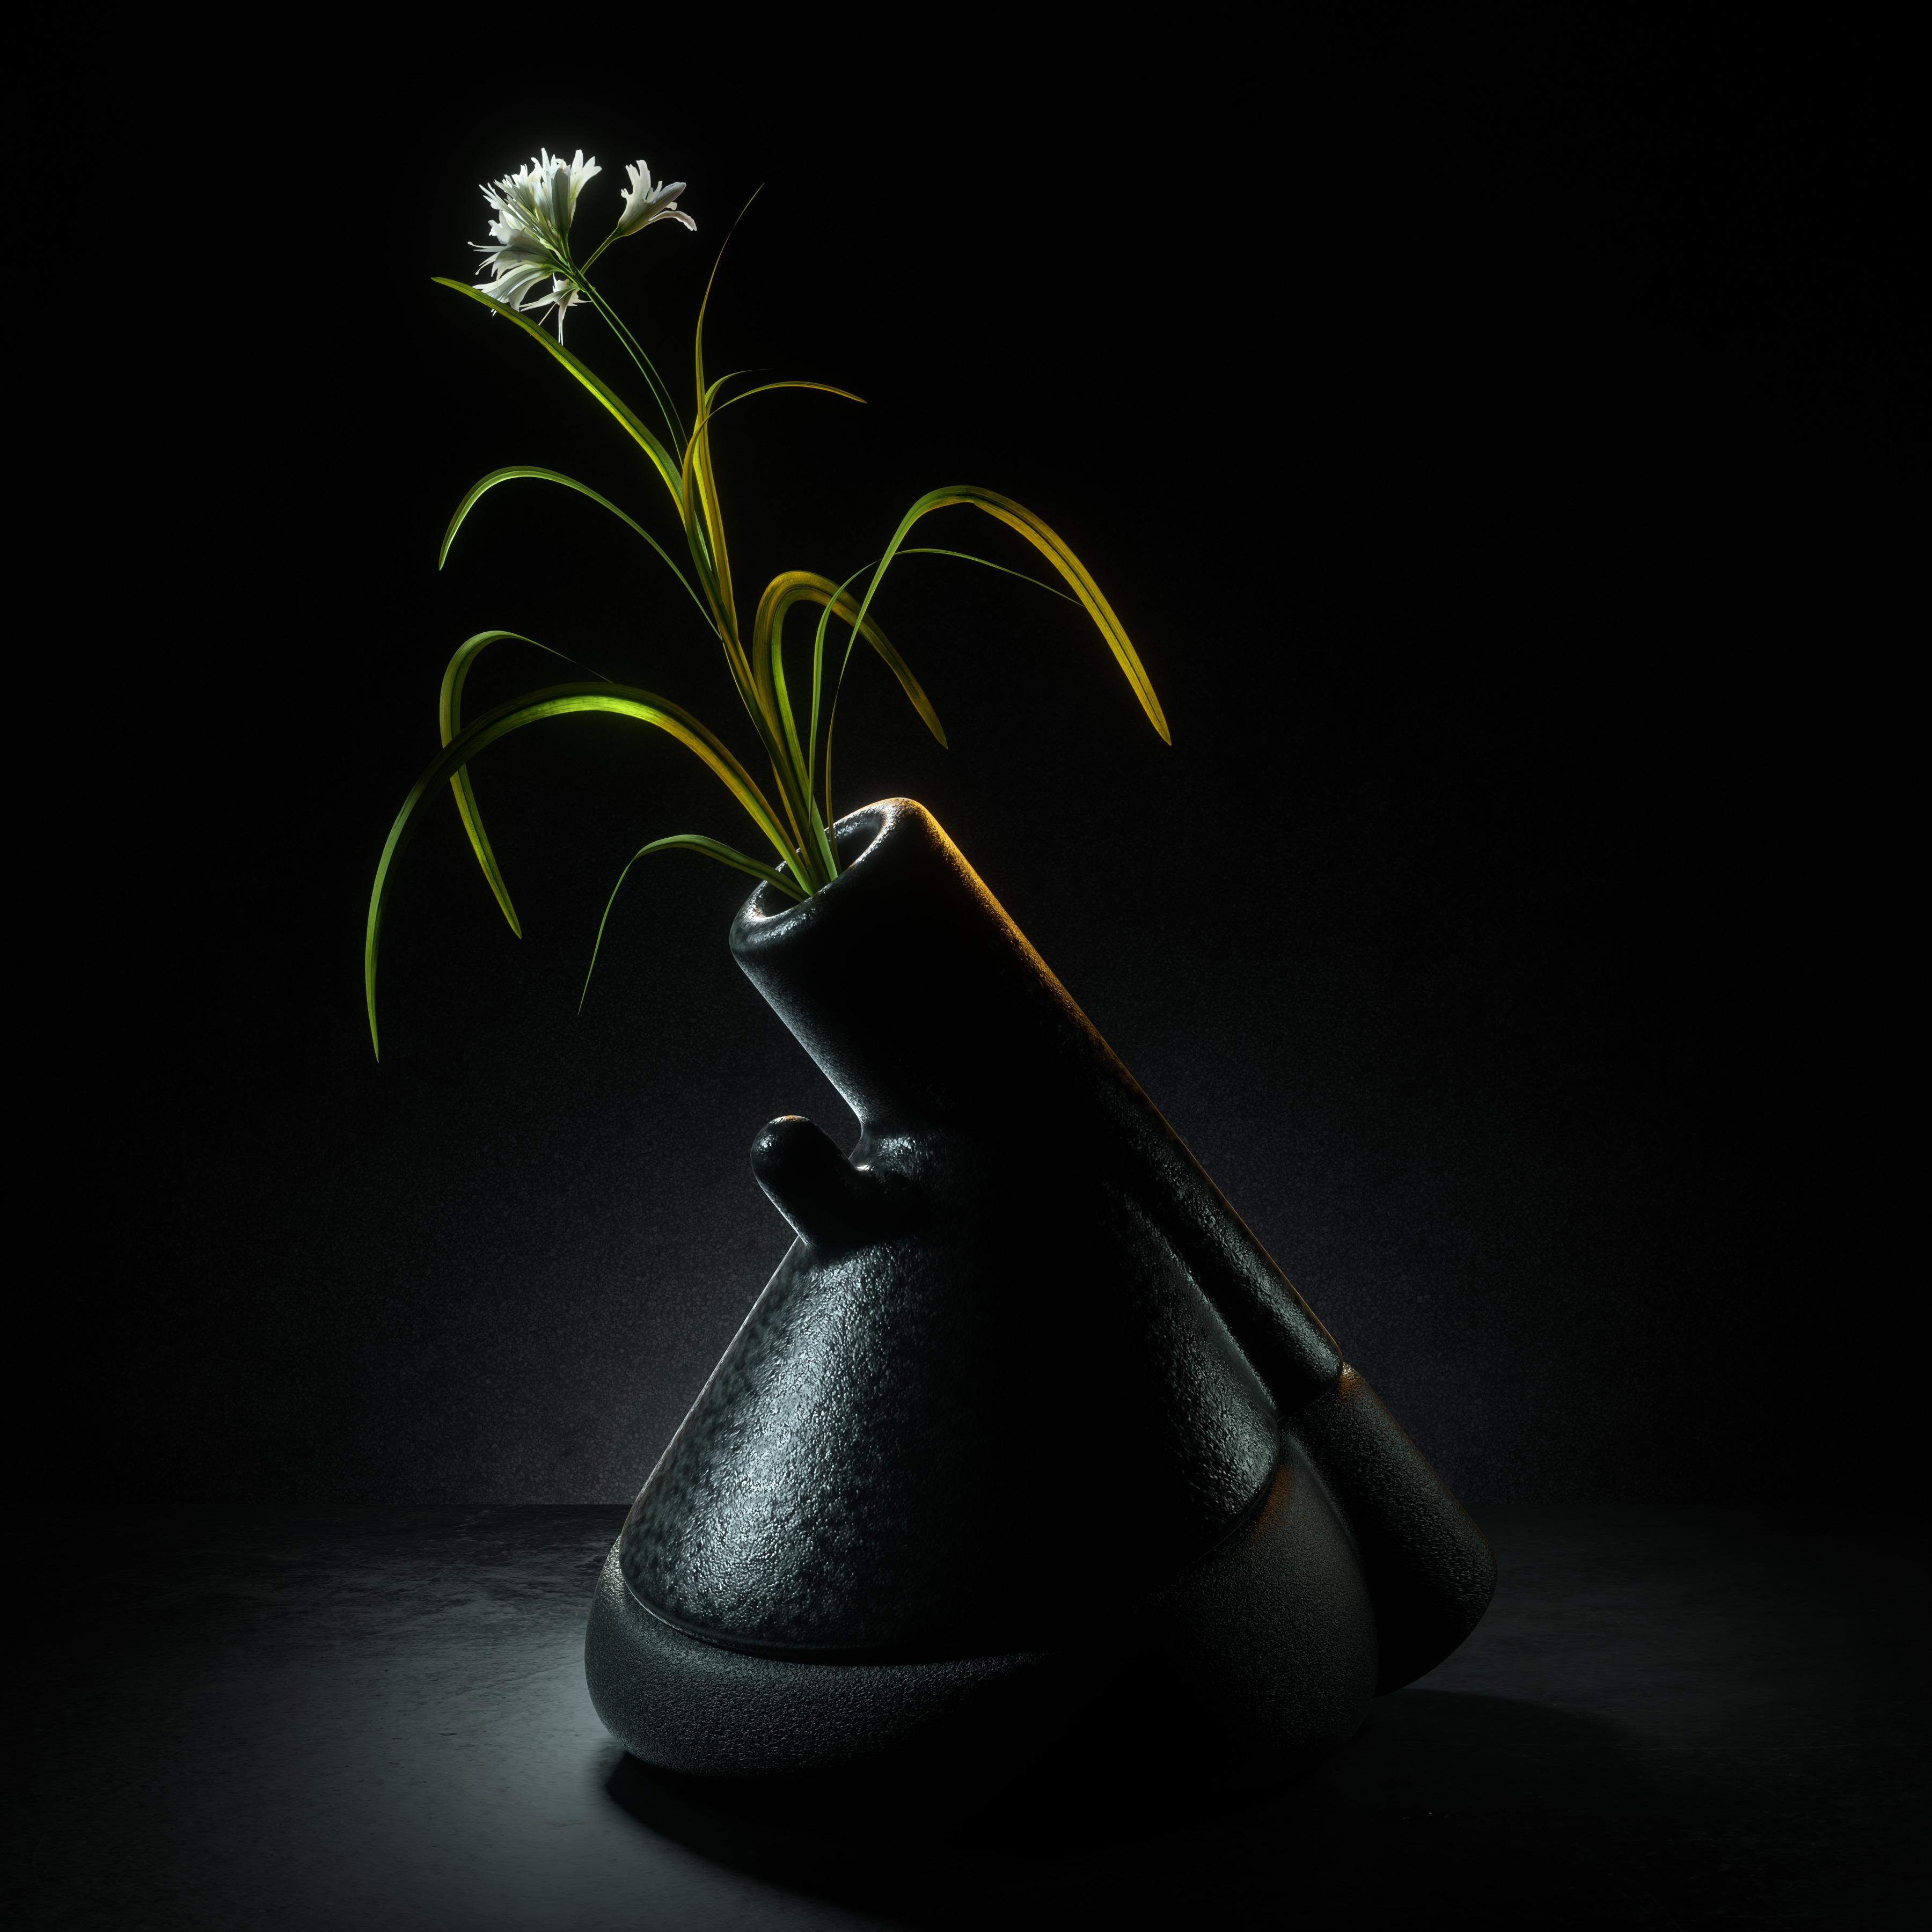 Vase3-Render